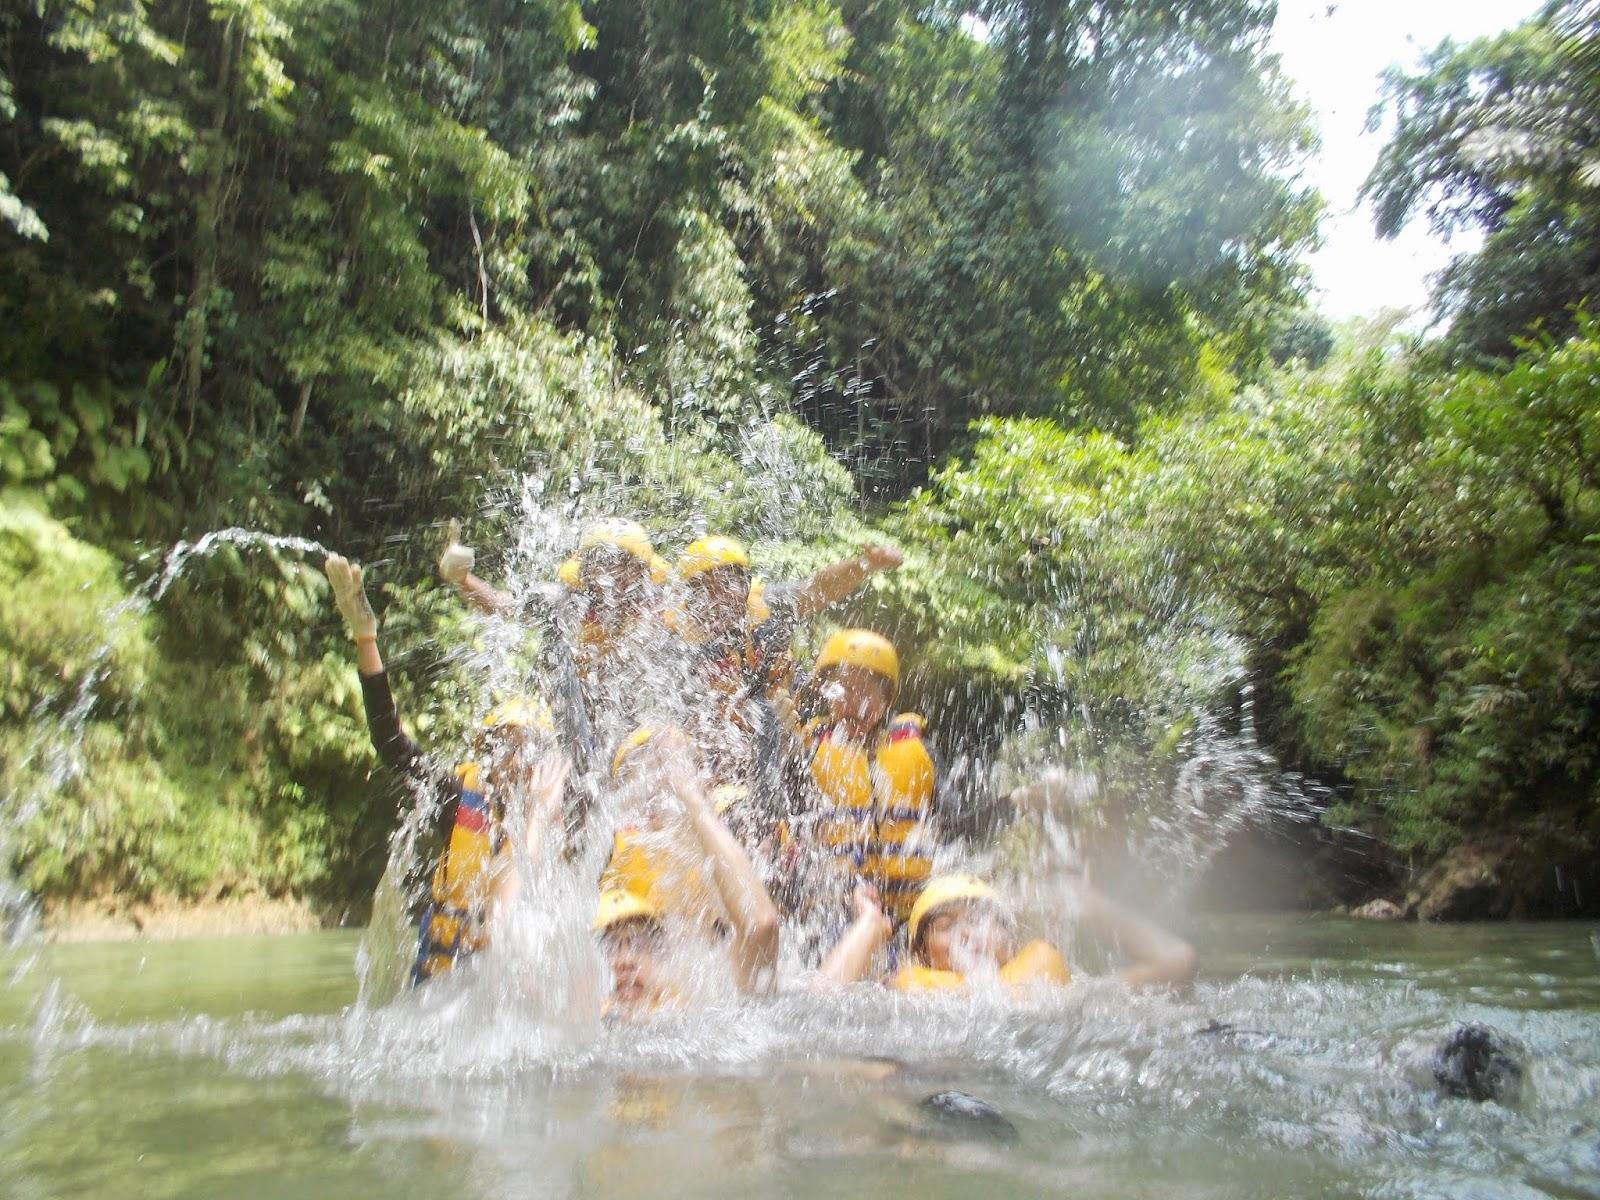 ceria bersama petualangan body rafting